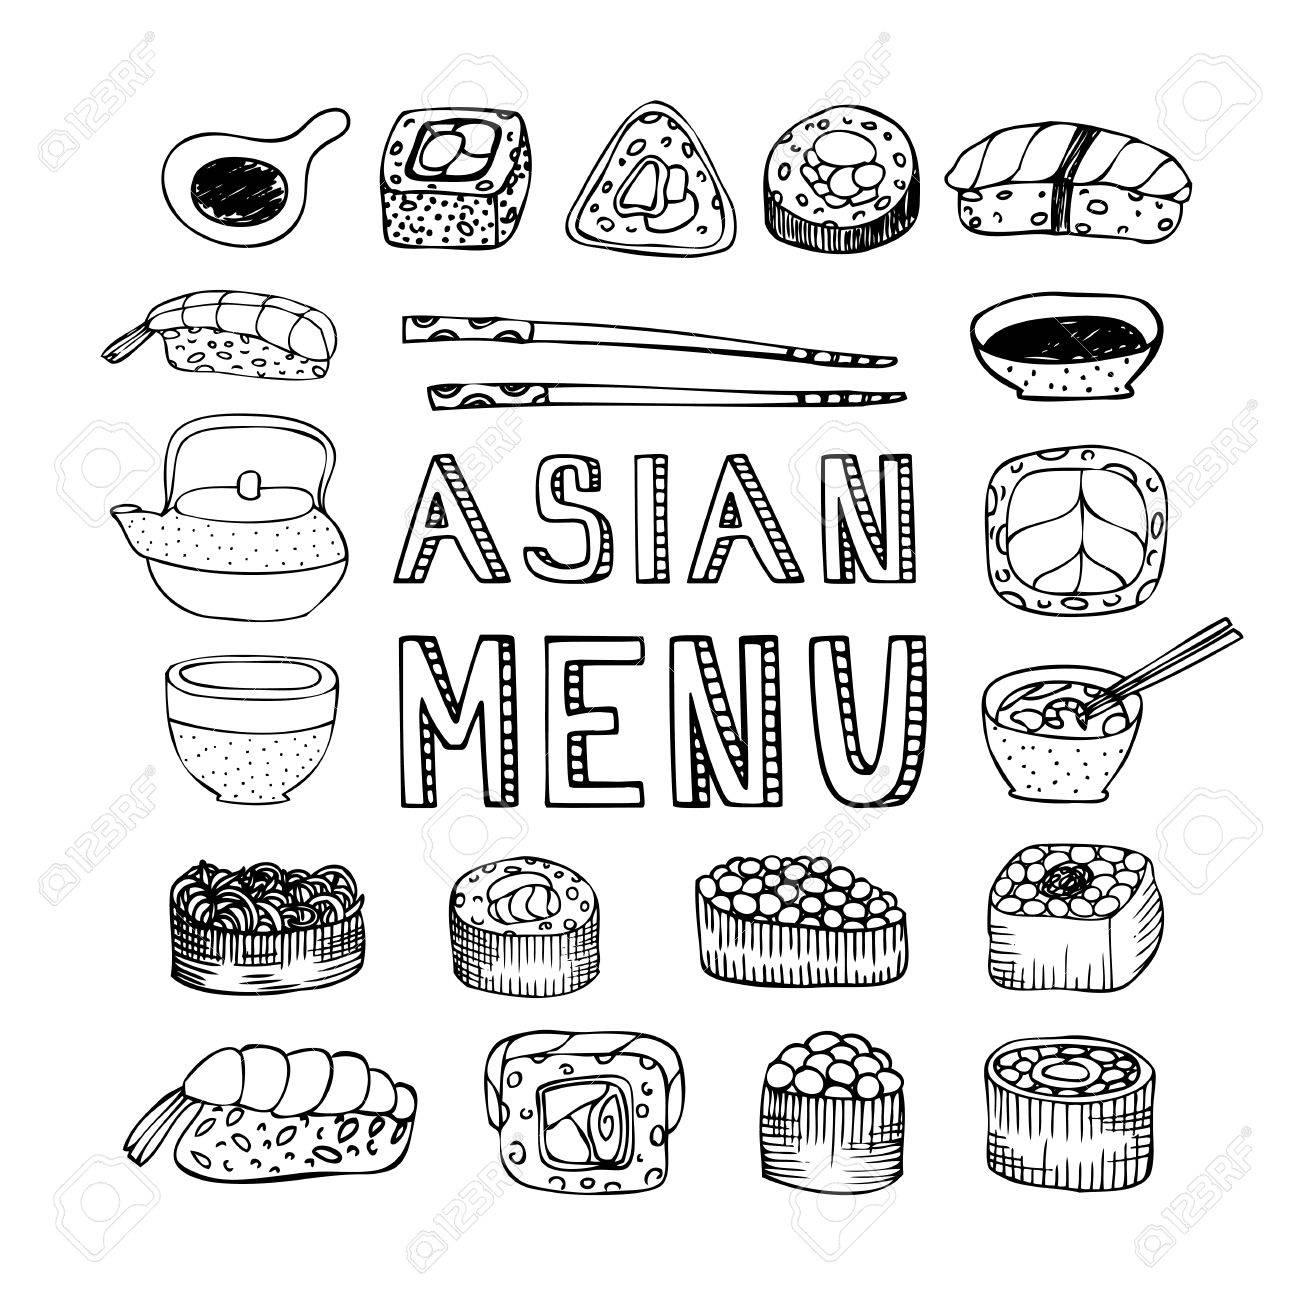 Asian Menu. Asian Kitchen. Asian Food Menu For Restaurant, Cafe ...